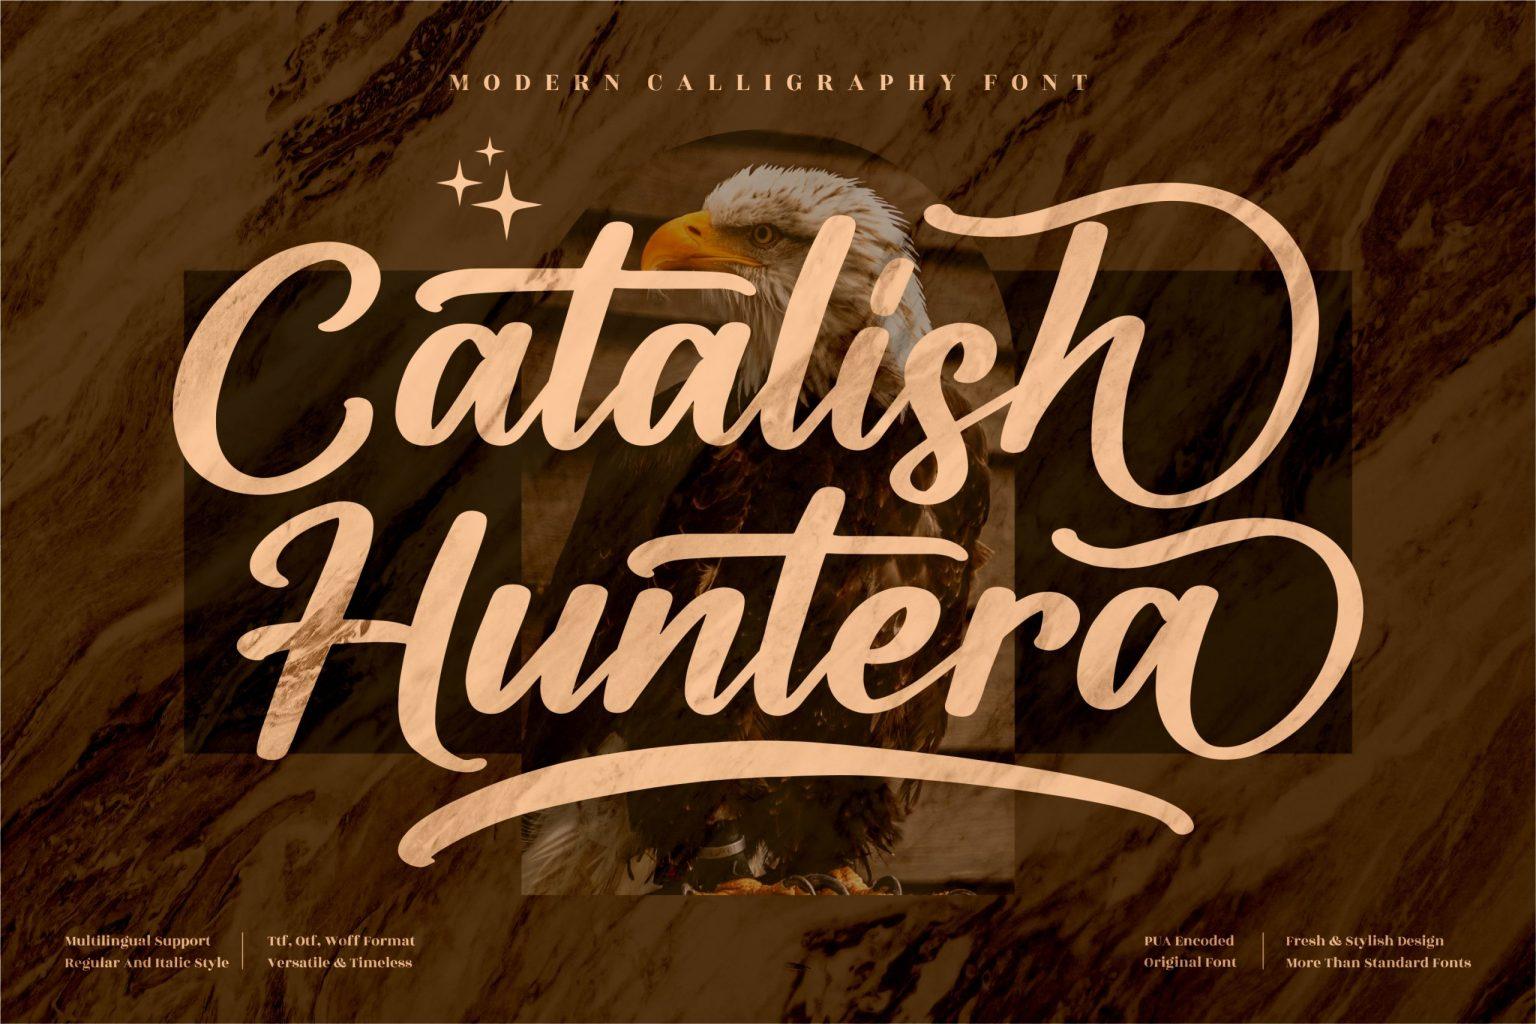 Catalish Huntera Script Font